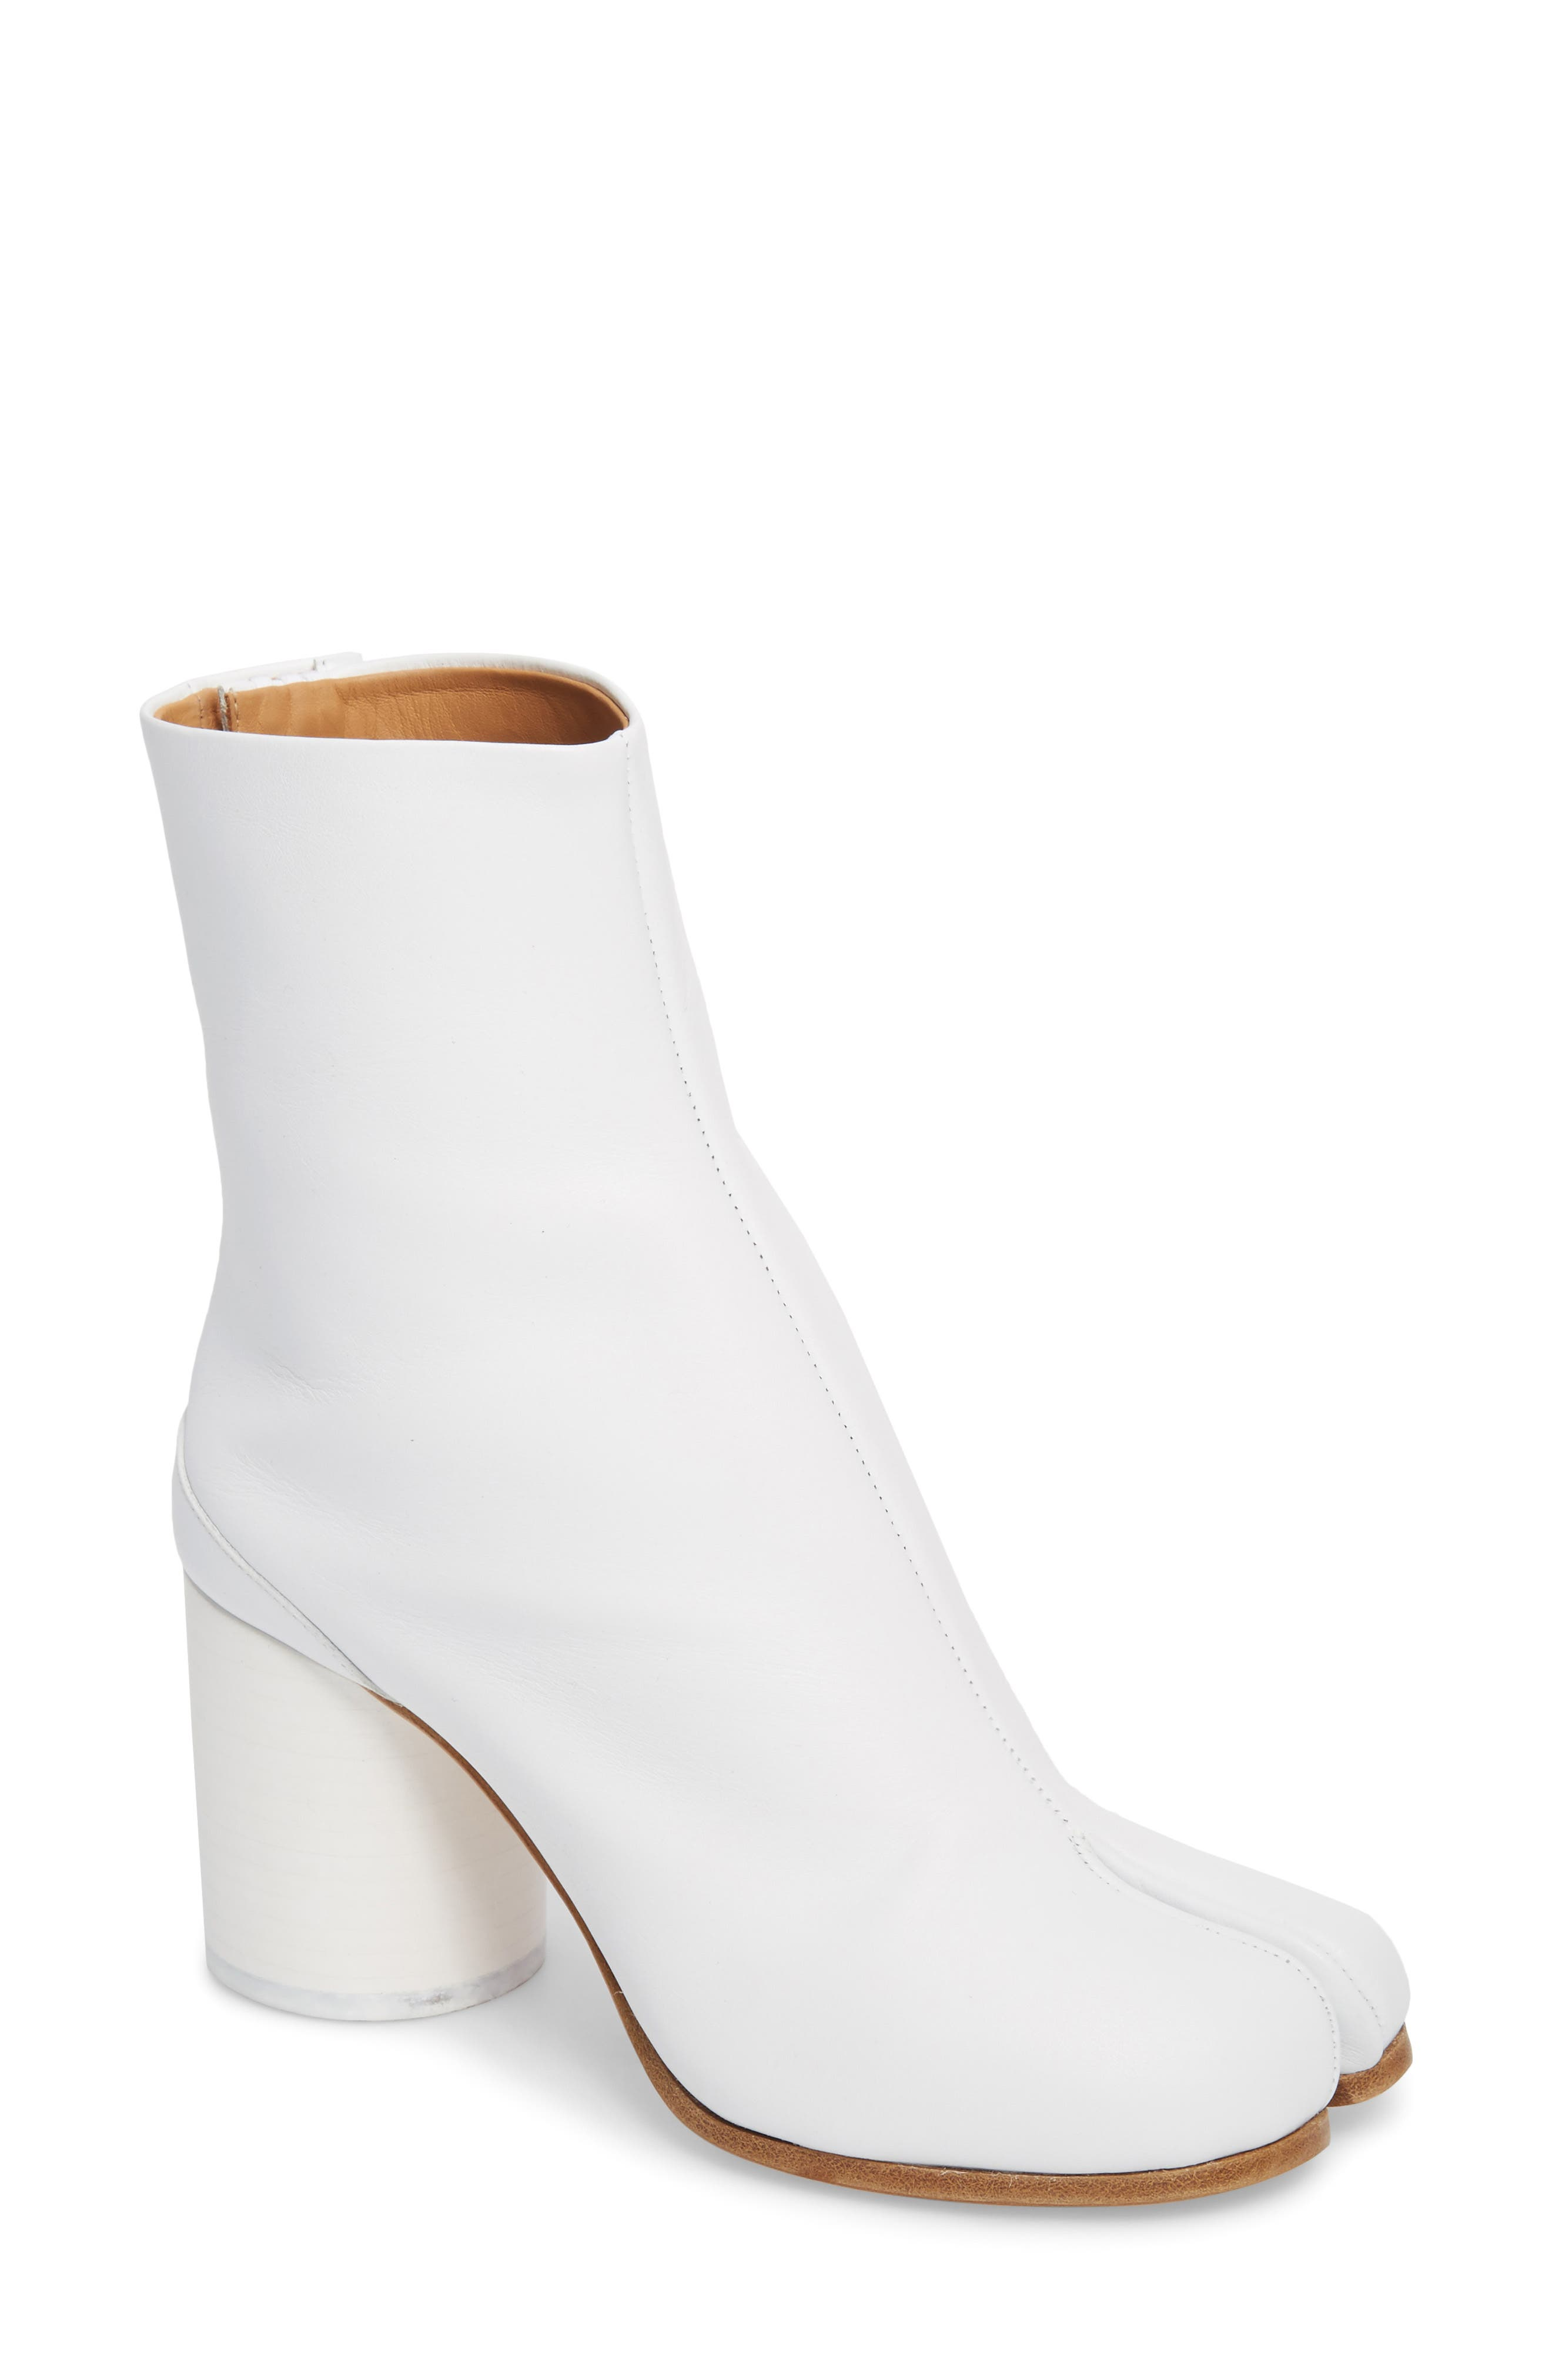 Tabi Boot,                         Main,                         color, White